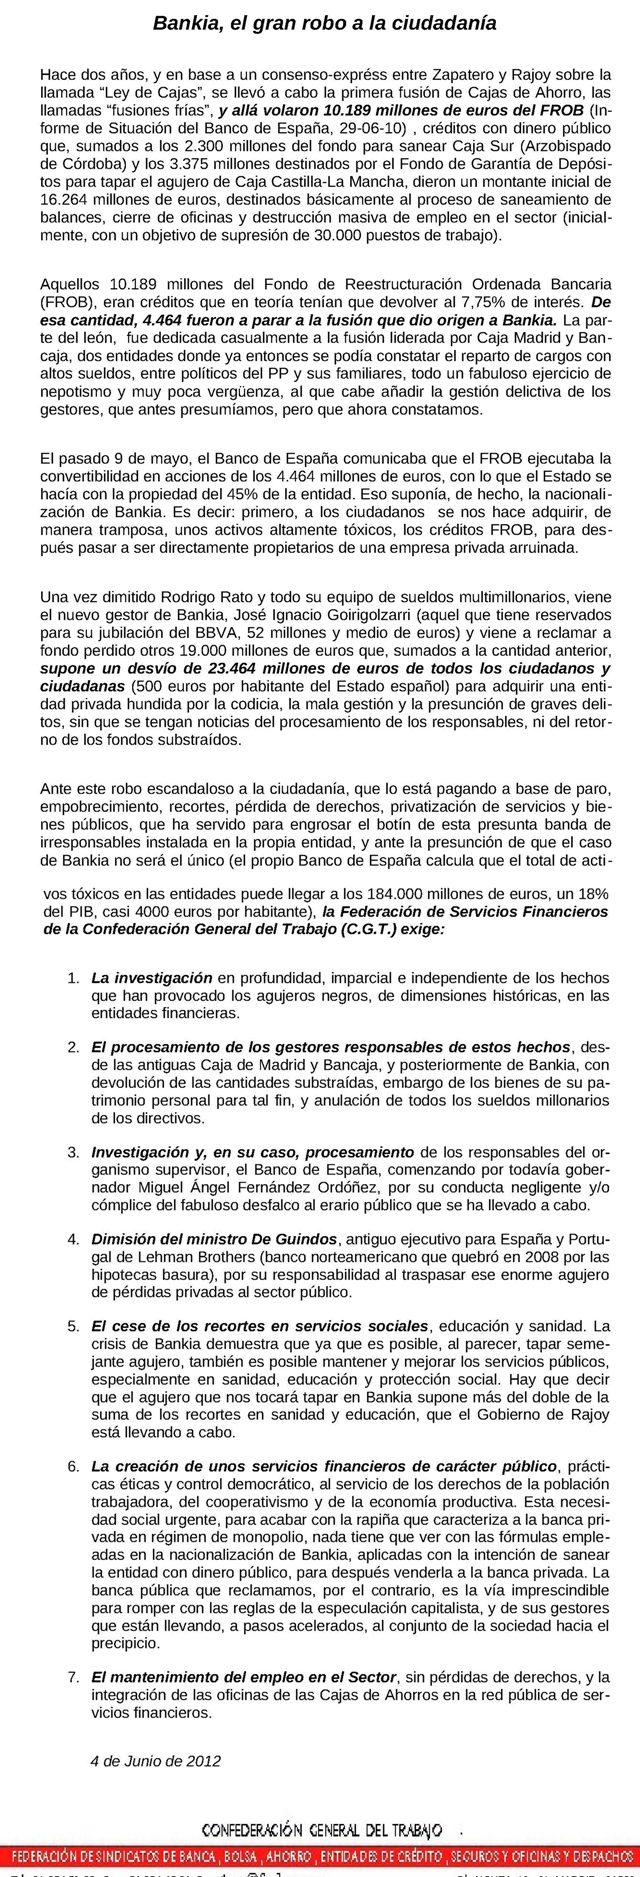 20120628203418-bankia-cgt.jpg